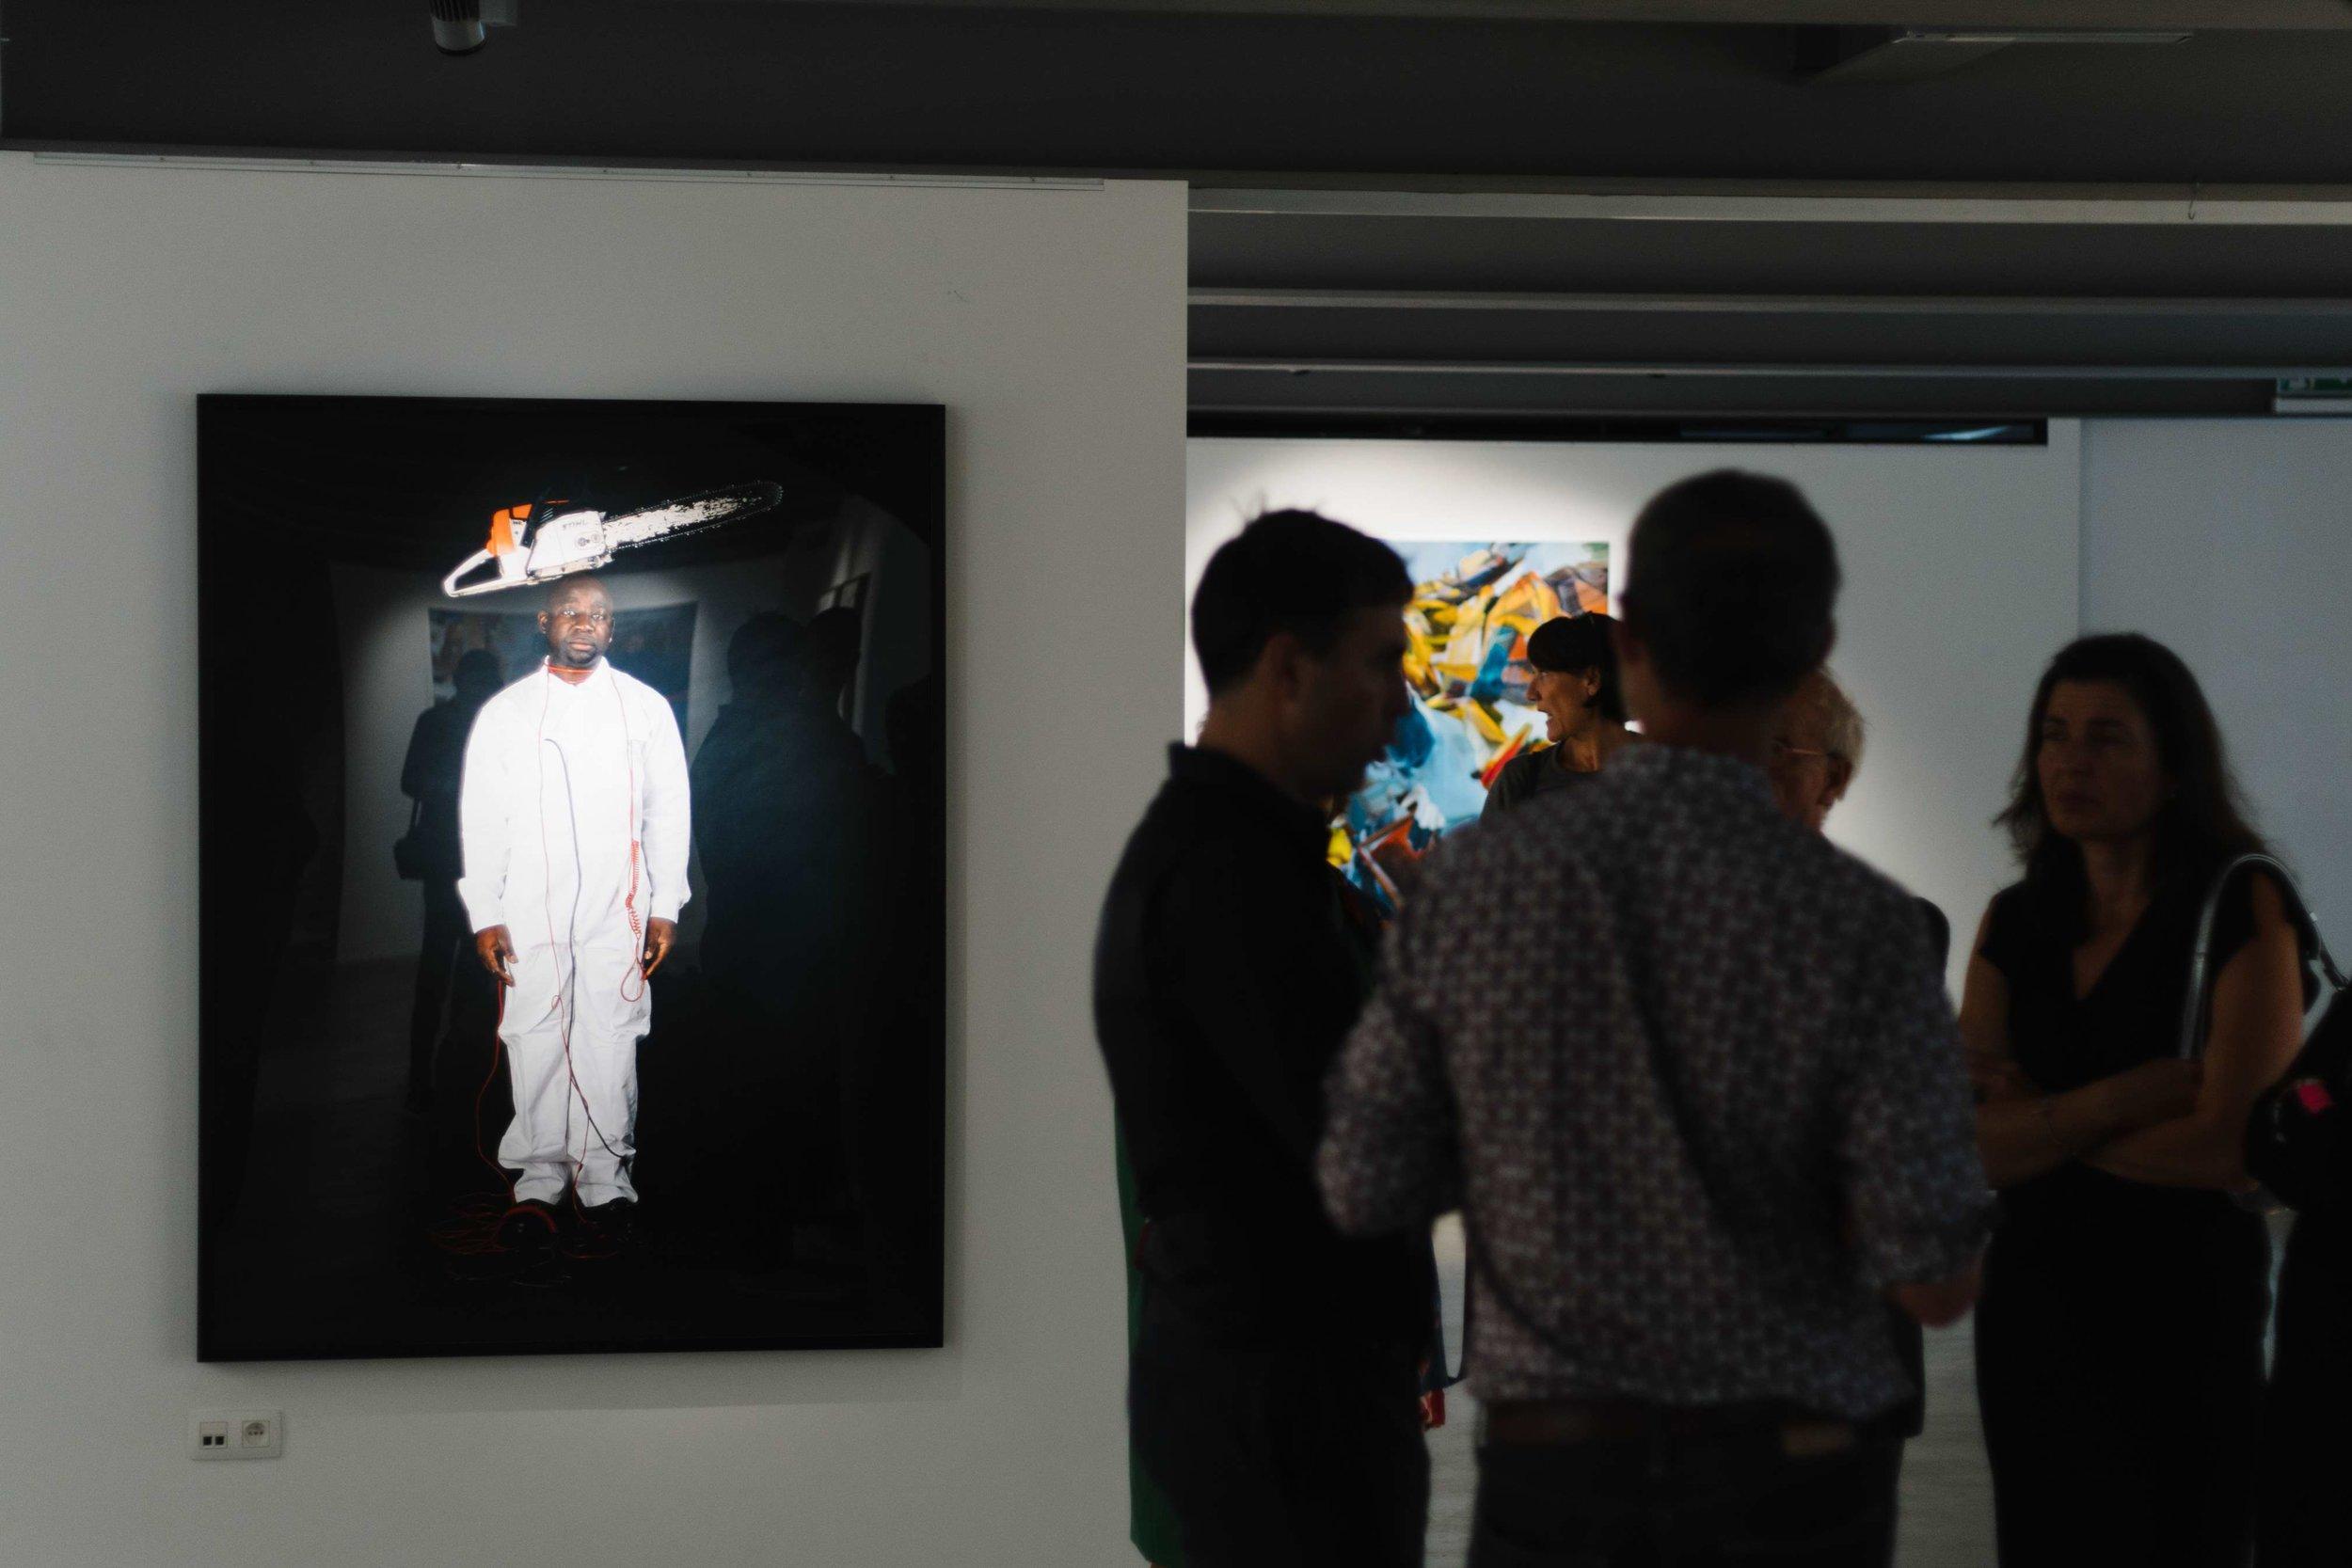 About the World , Barthélémy Toguo - Duncan Wylie, Hangar Arts Centre, Brussels, Sept/Oct 2018, curator Philip Piguet